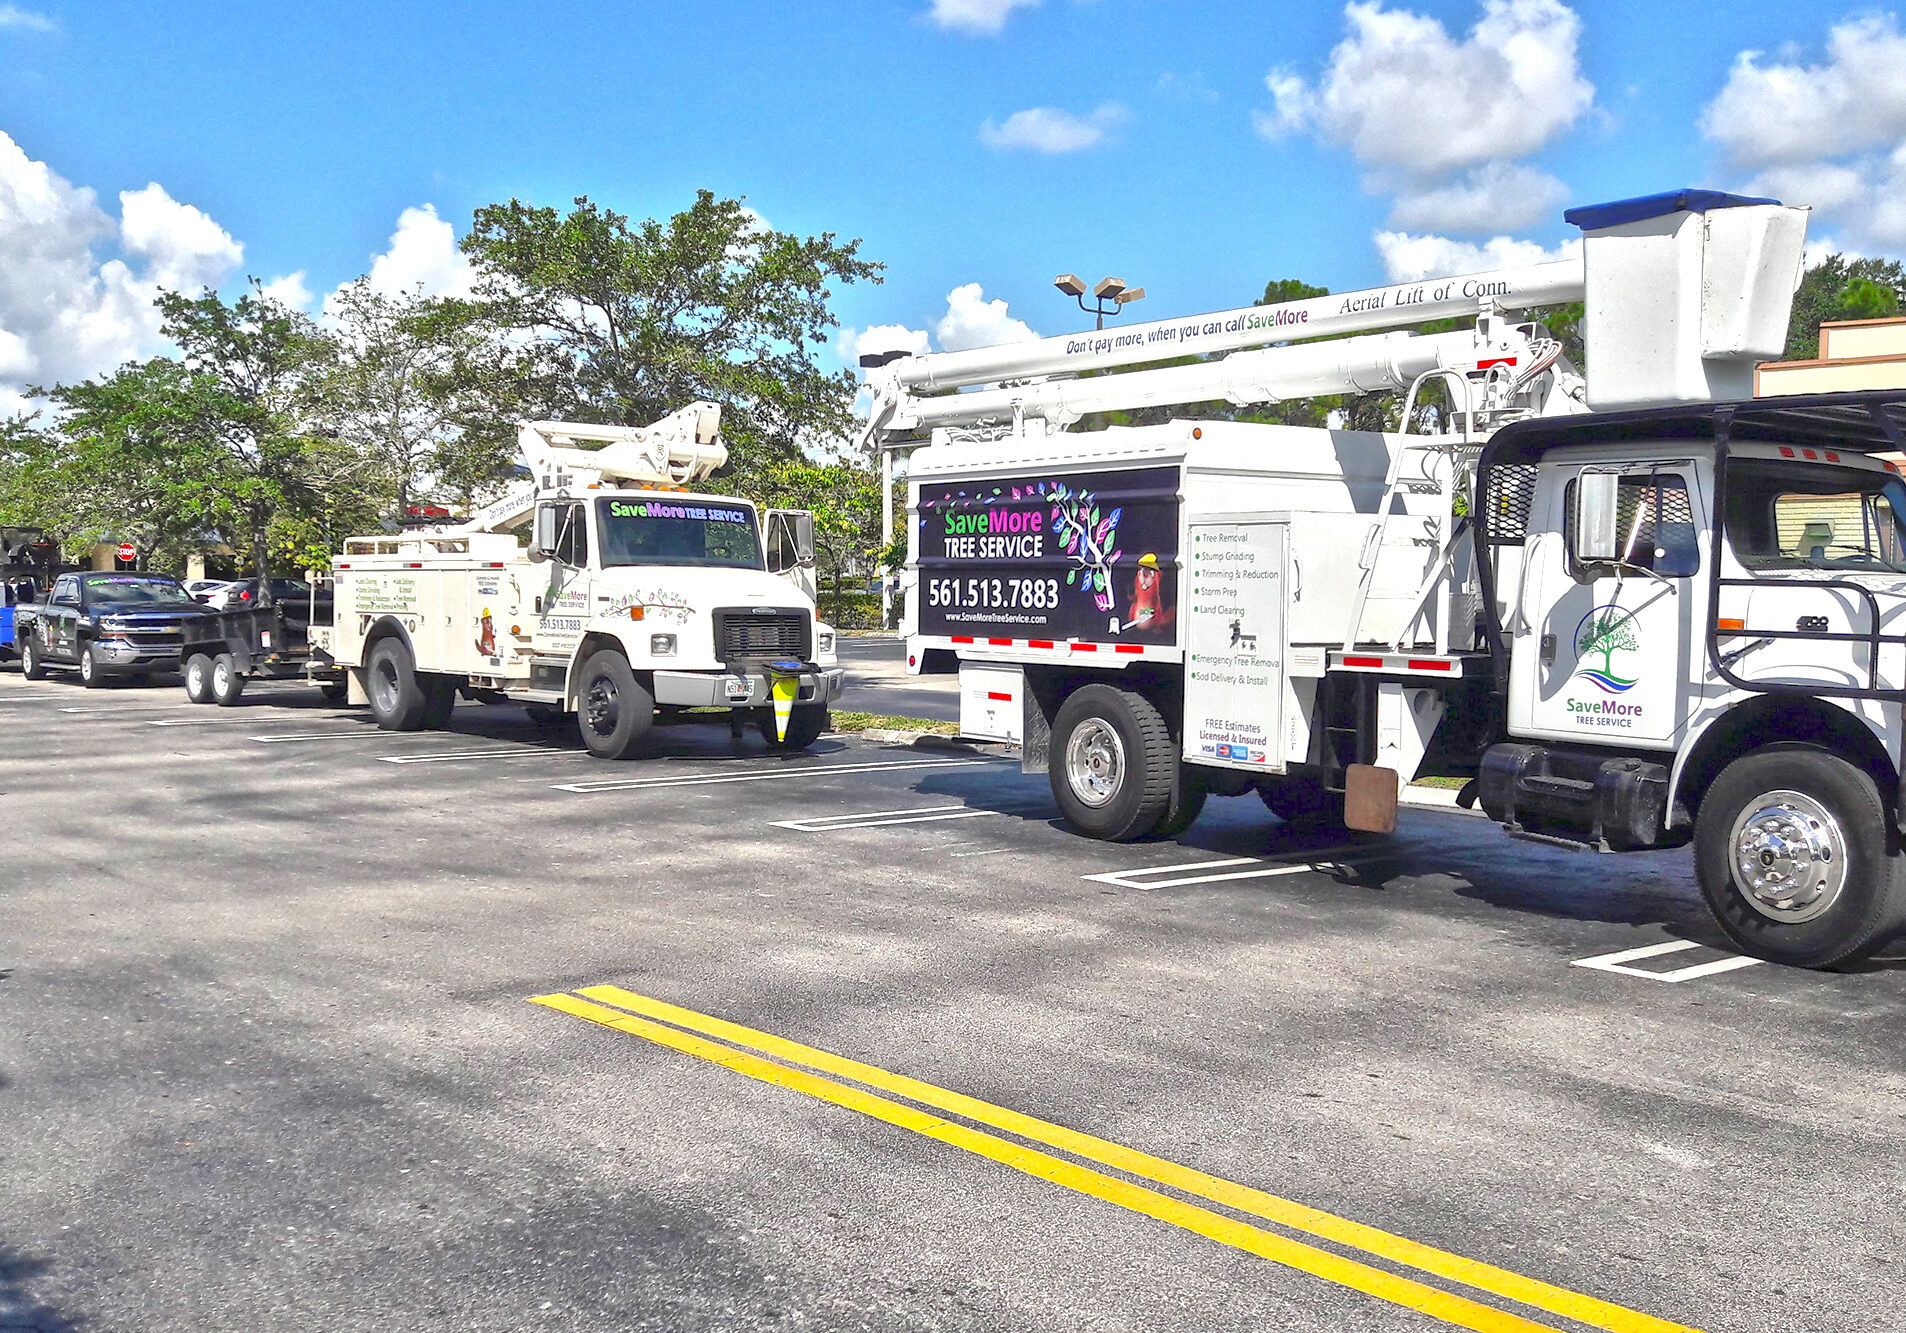 SaveMore Tree Service Fleet